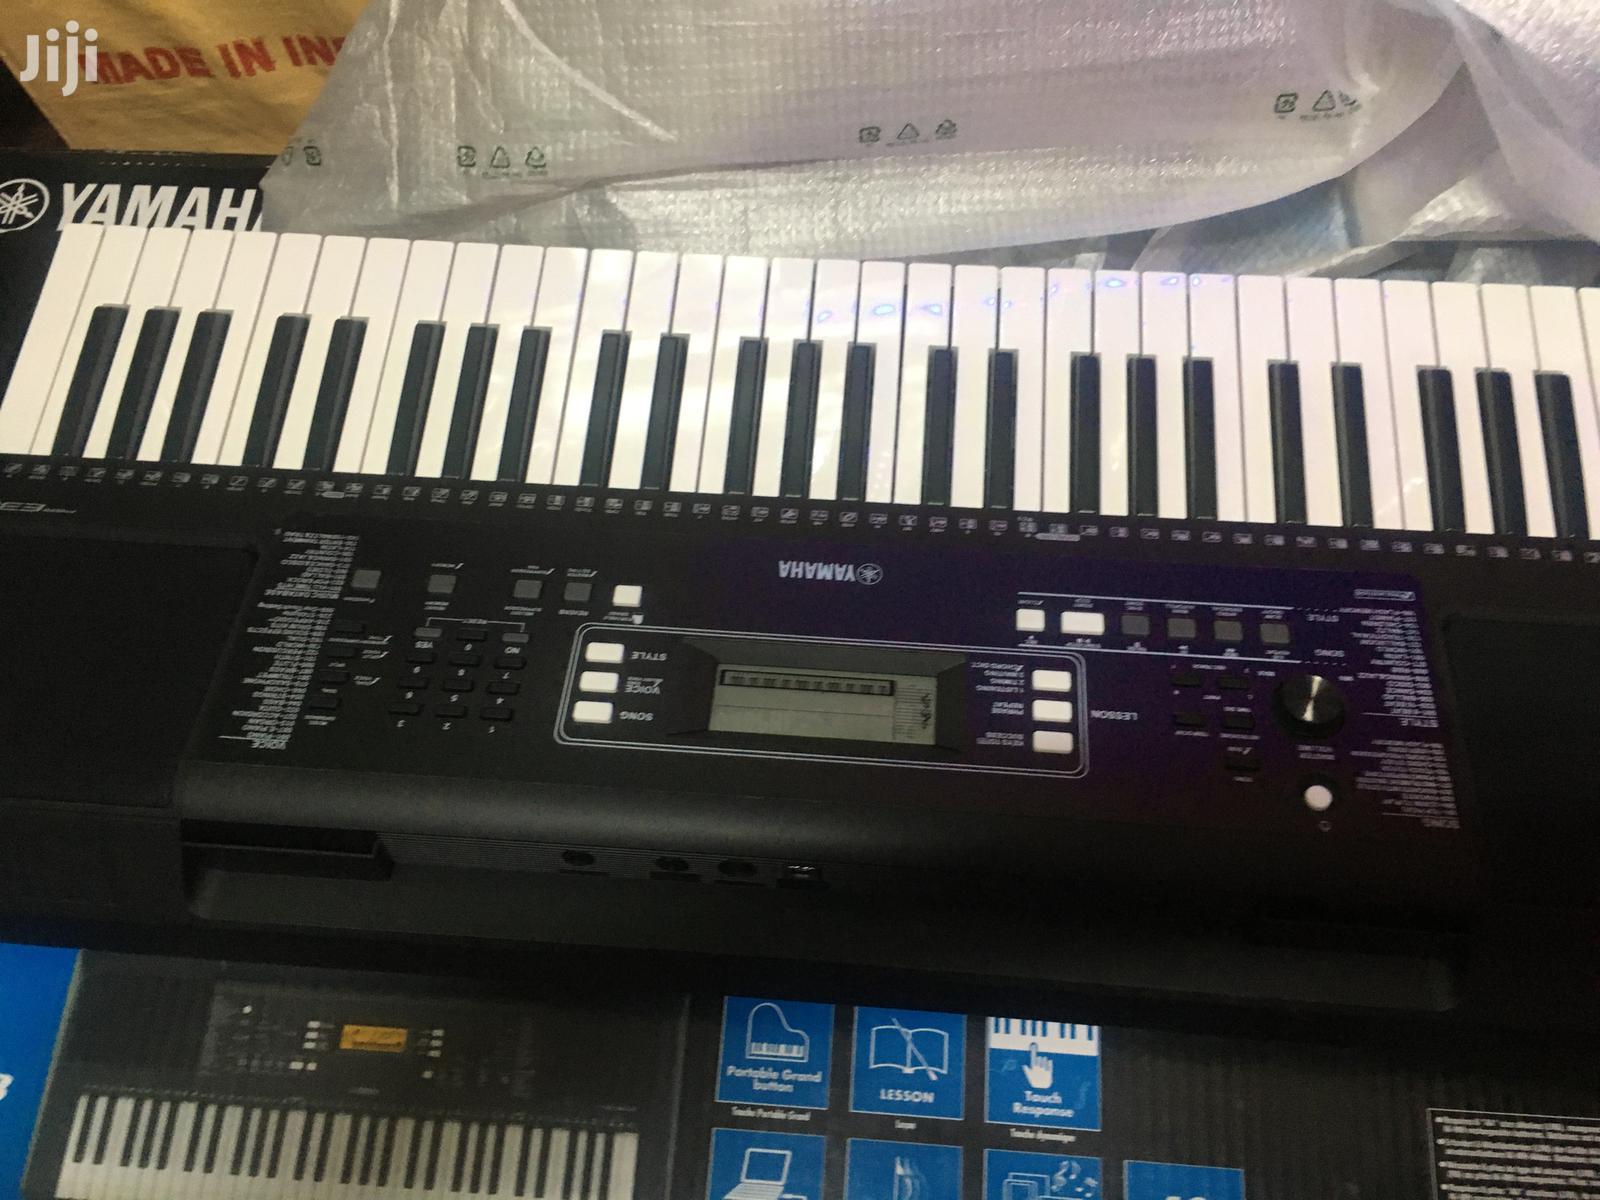 Yamaha Keyboard   Audio & Music Equipment for sale in Kampala, Central Region, Uganda